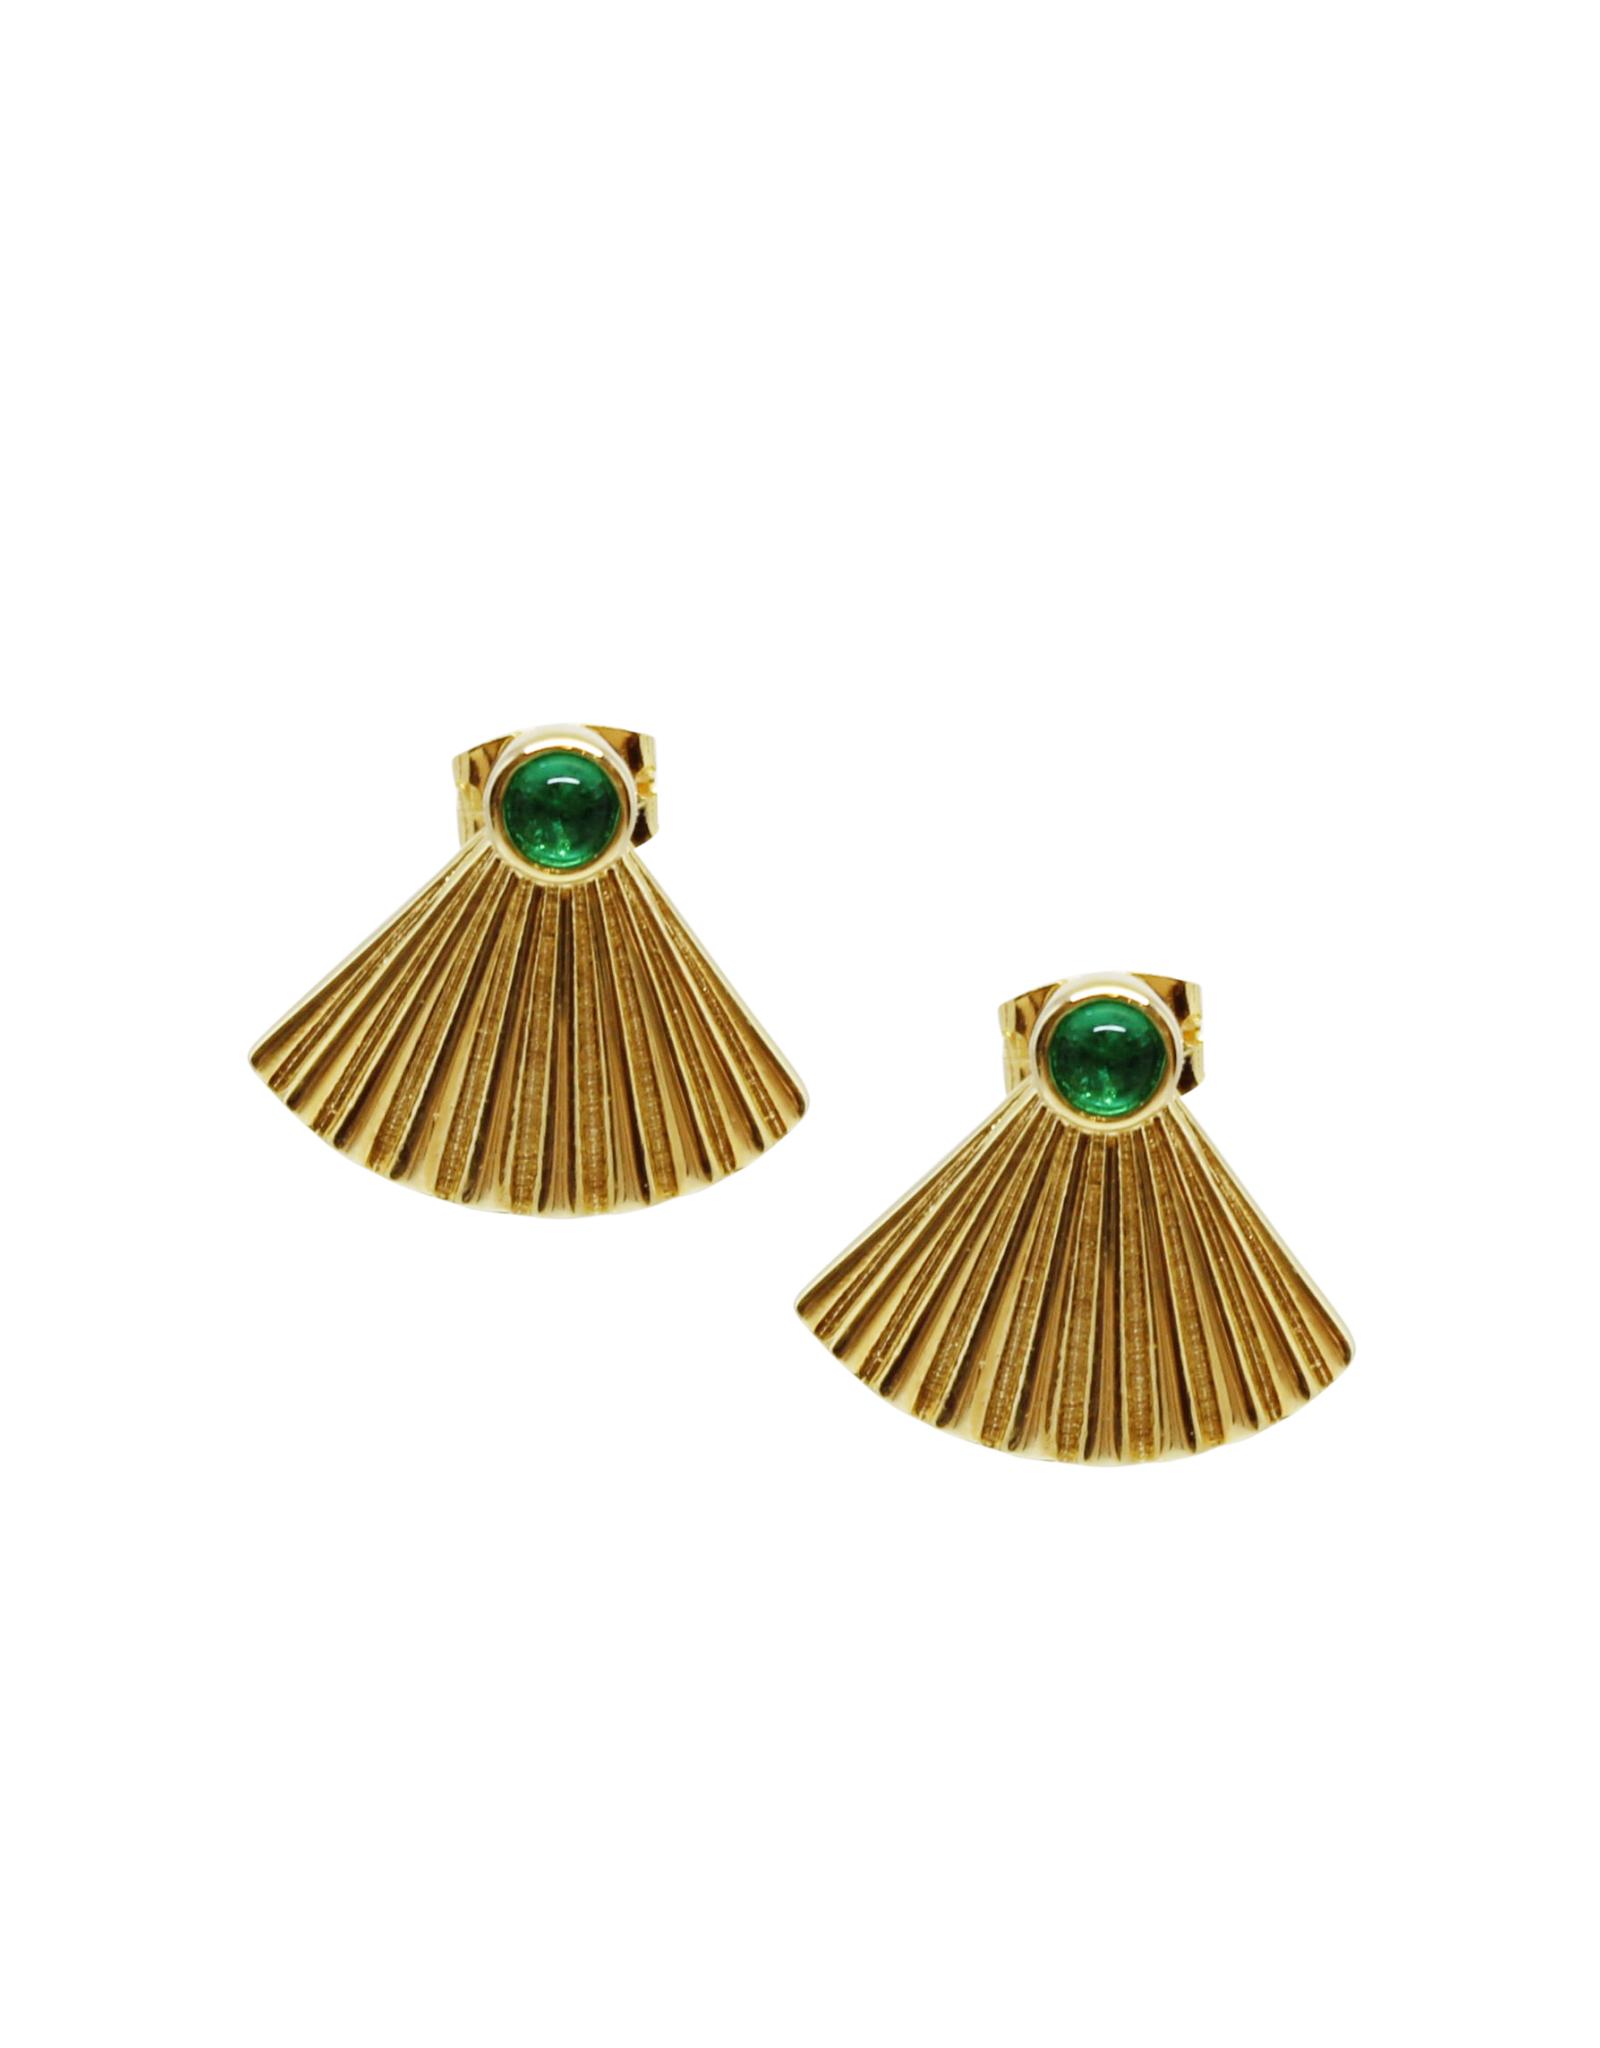 Vayu Jewels Vintage Fan Studs - Emerald Green